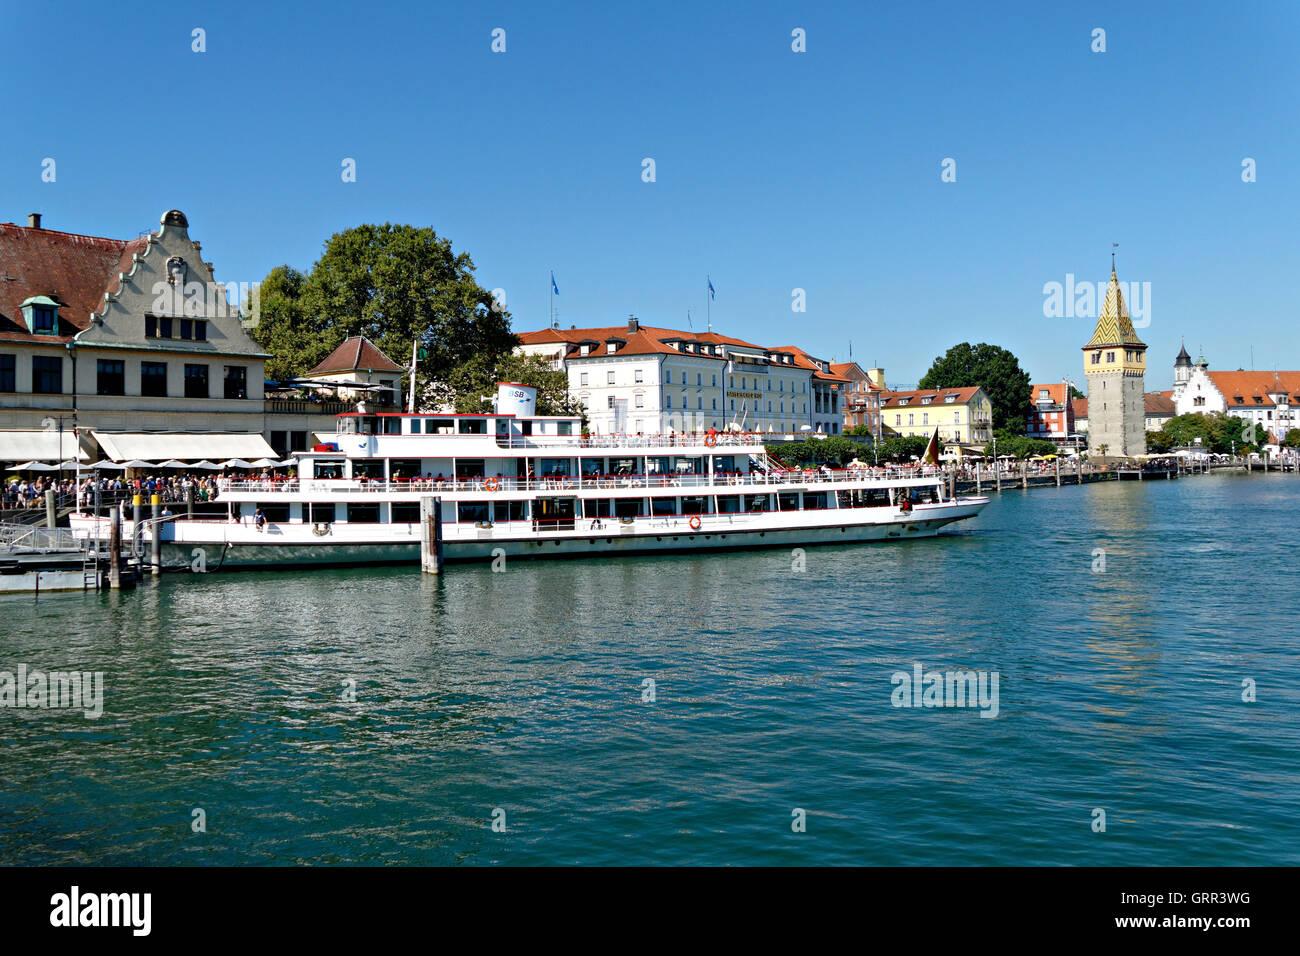 Passenger ferry and boardwalk harbor, Lindau, Swabia, Bavaria, Germany, Europe Stock Photo